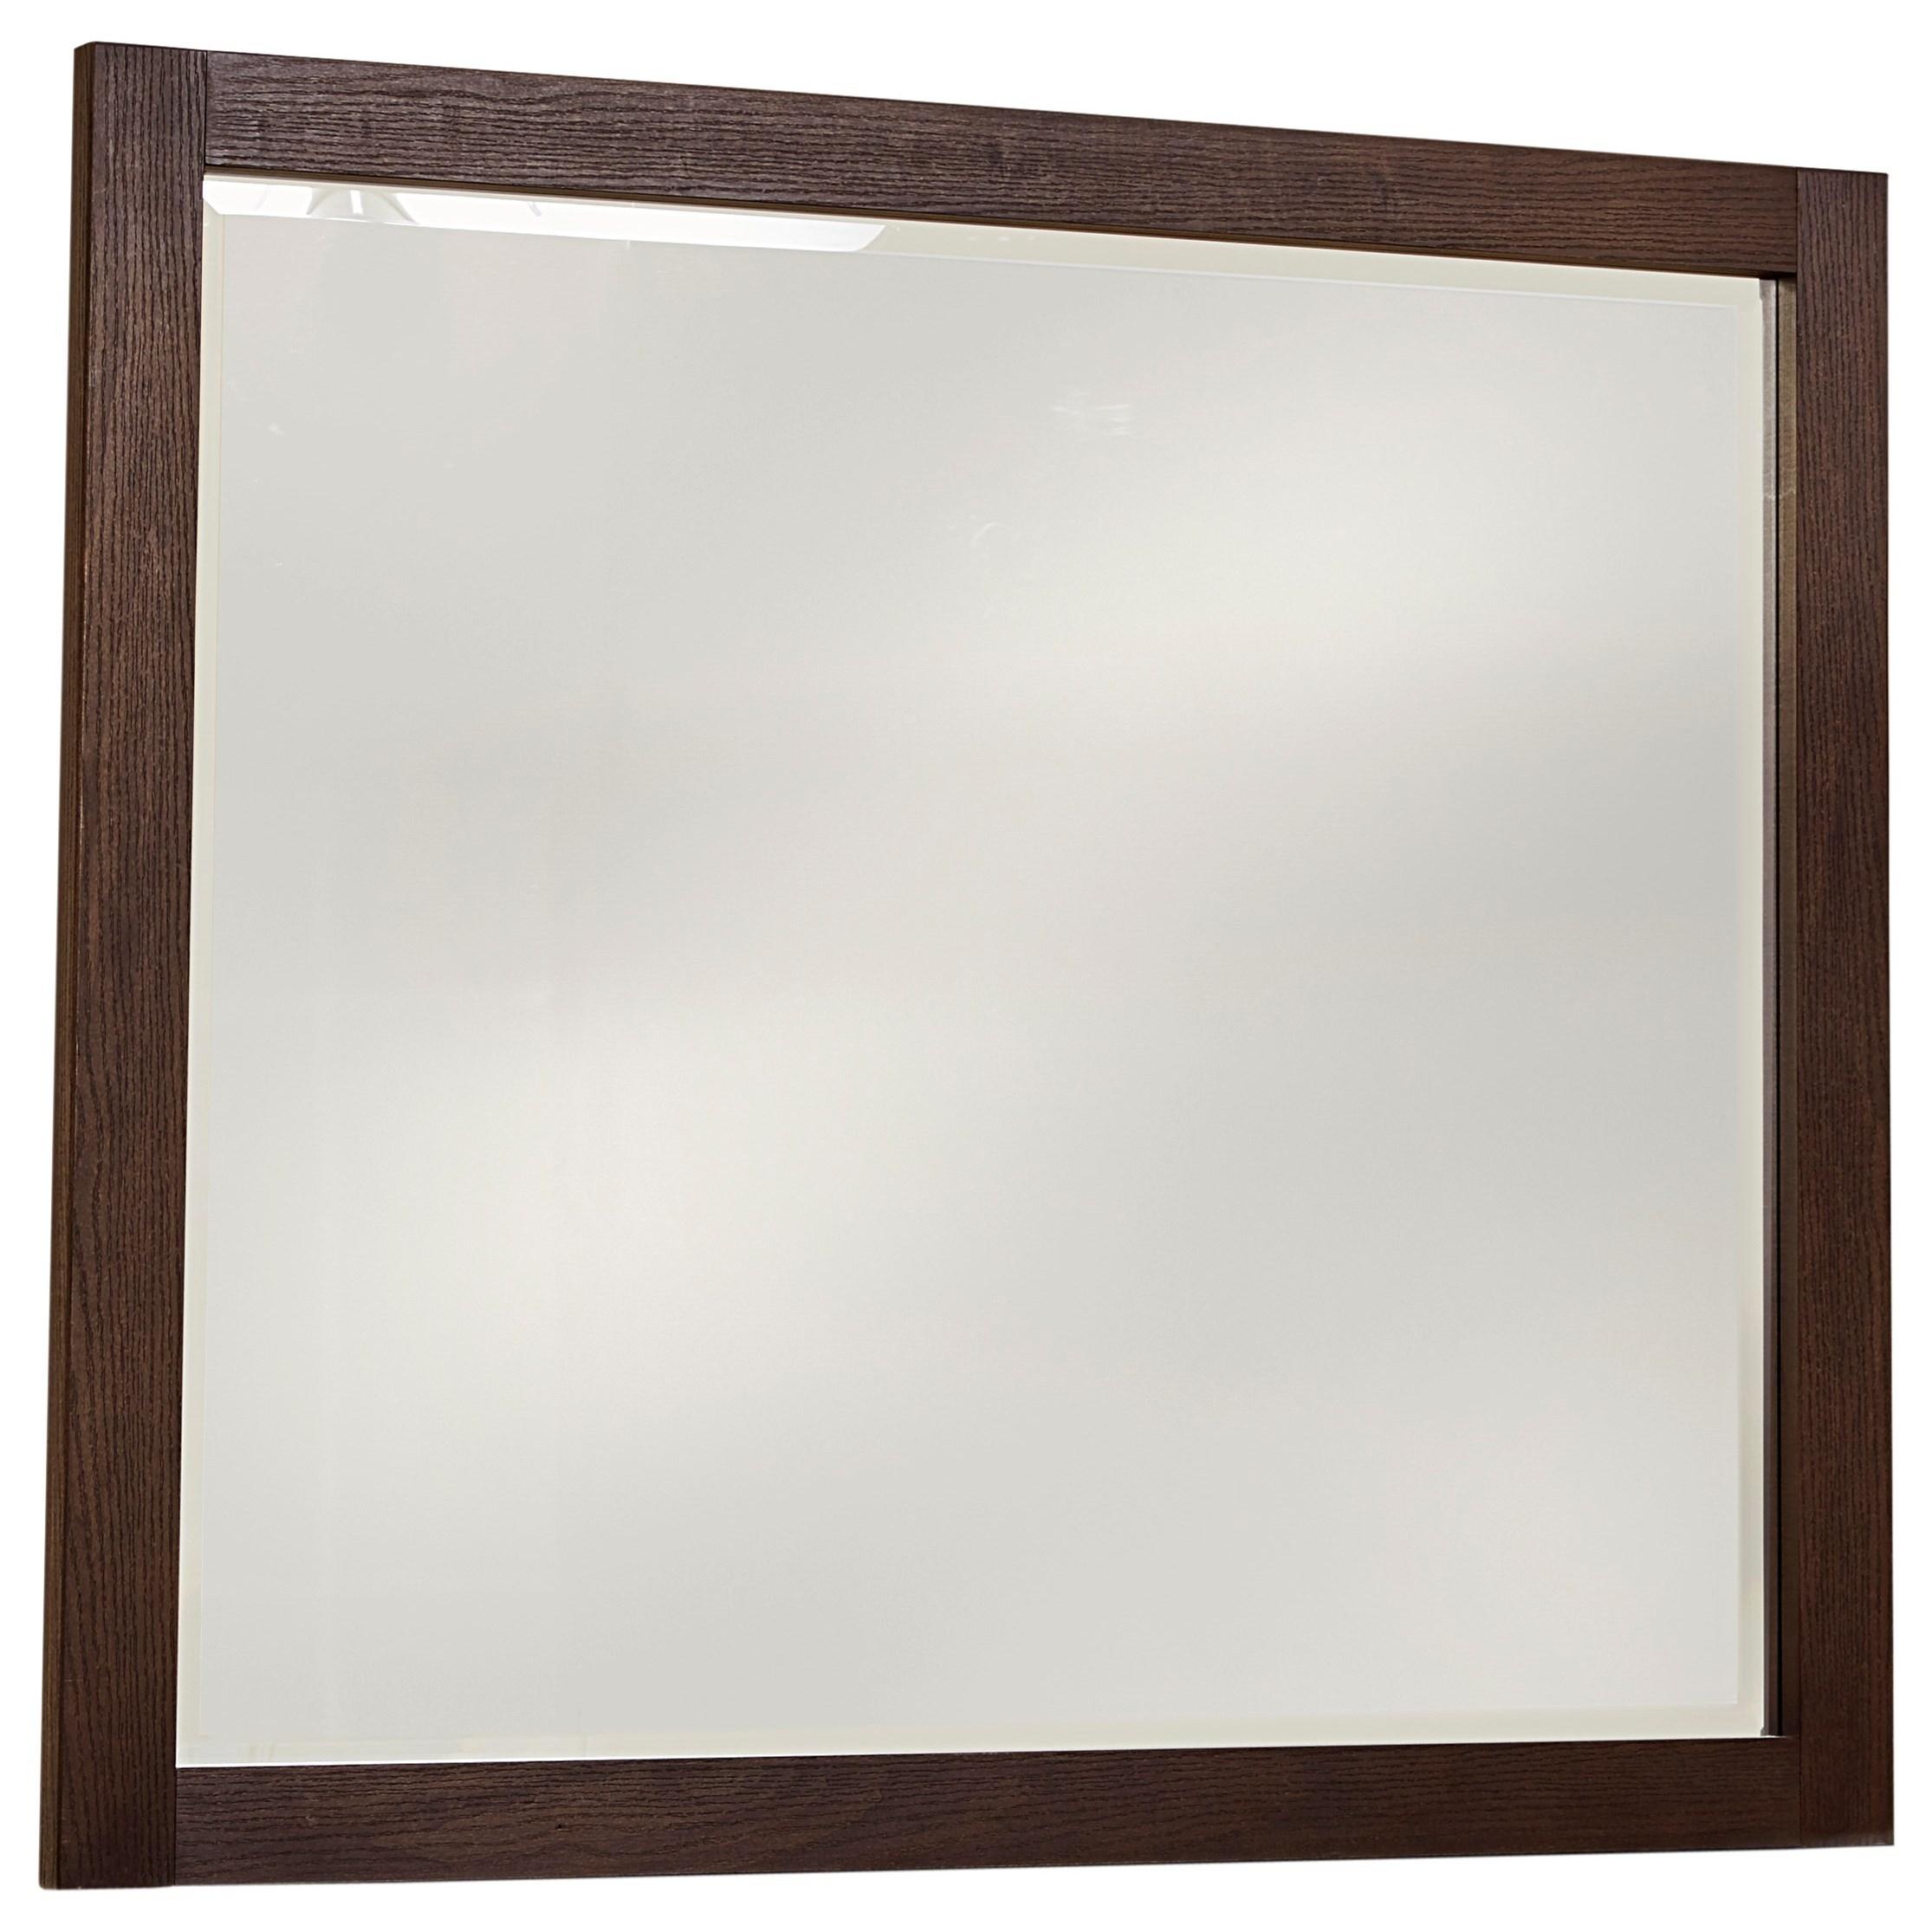 Vaughan Bassett American Modern Landscape Mirror - Beveled Glass - Item Number: 650-446